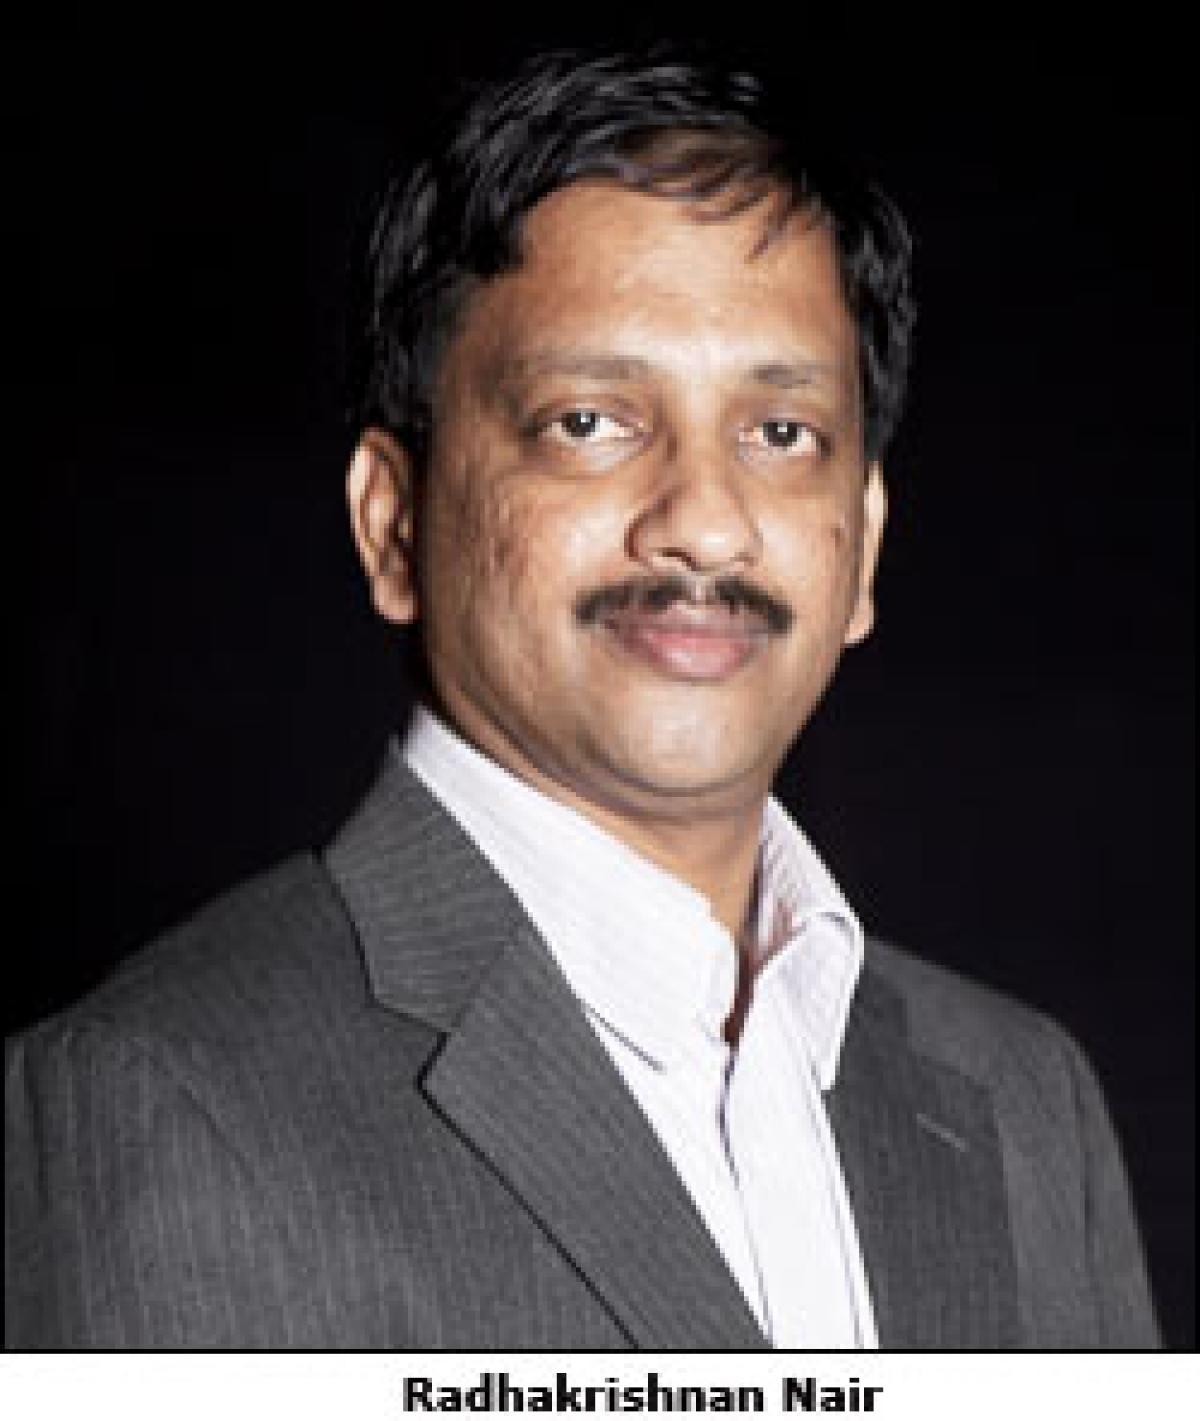 Radhakrishnan Nair promoted to managing editor at CNN-IBN